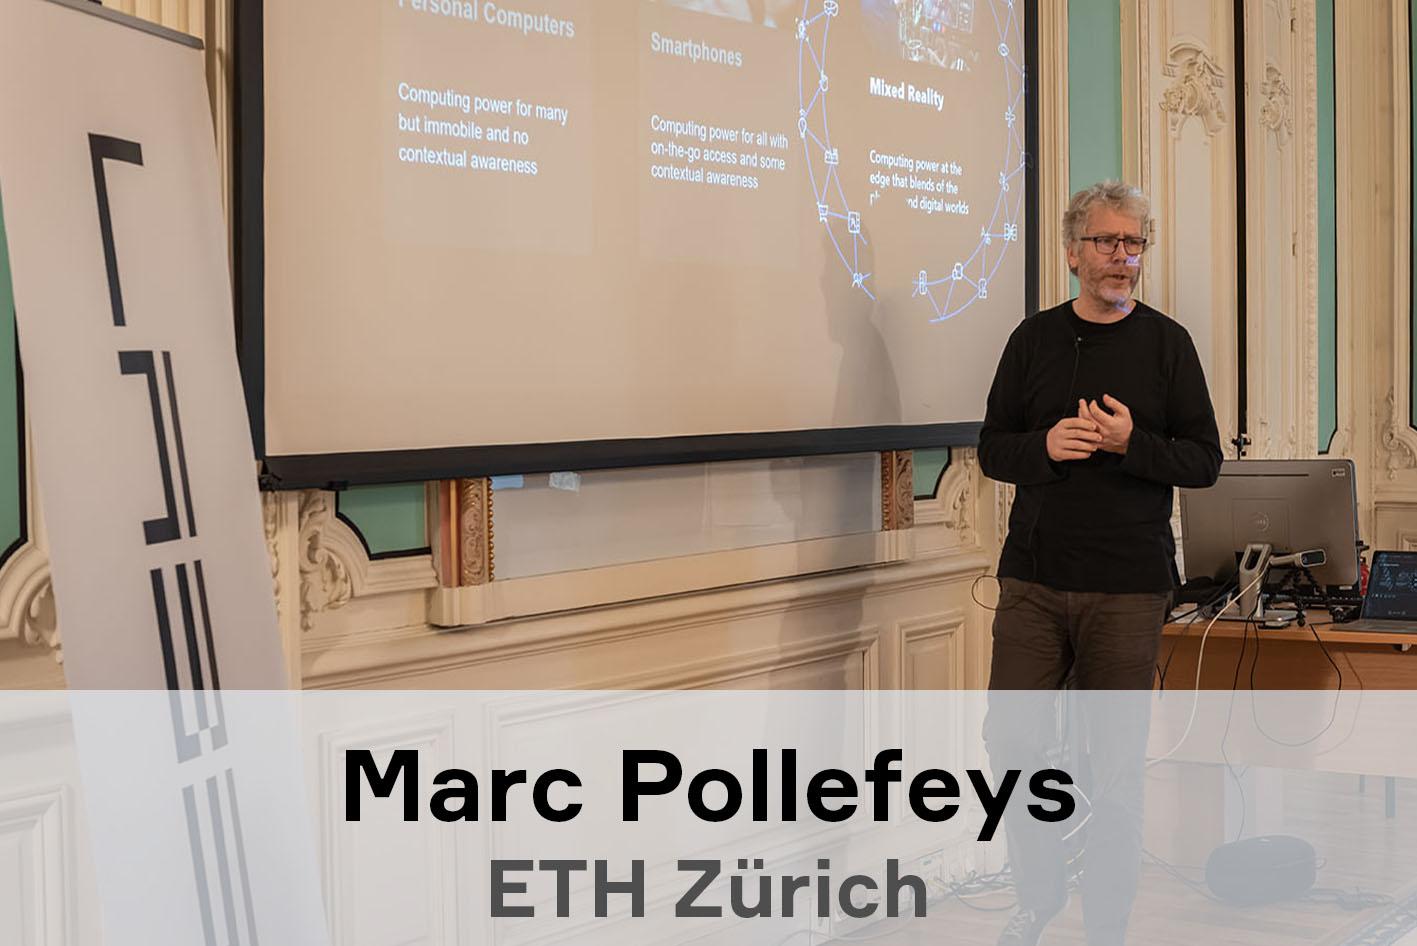 Marc_Pollefeys